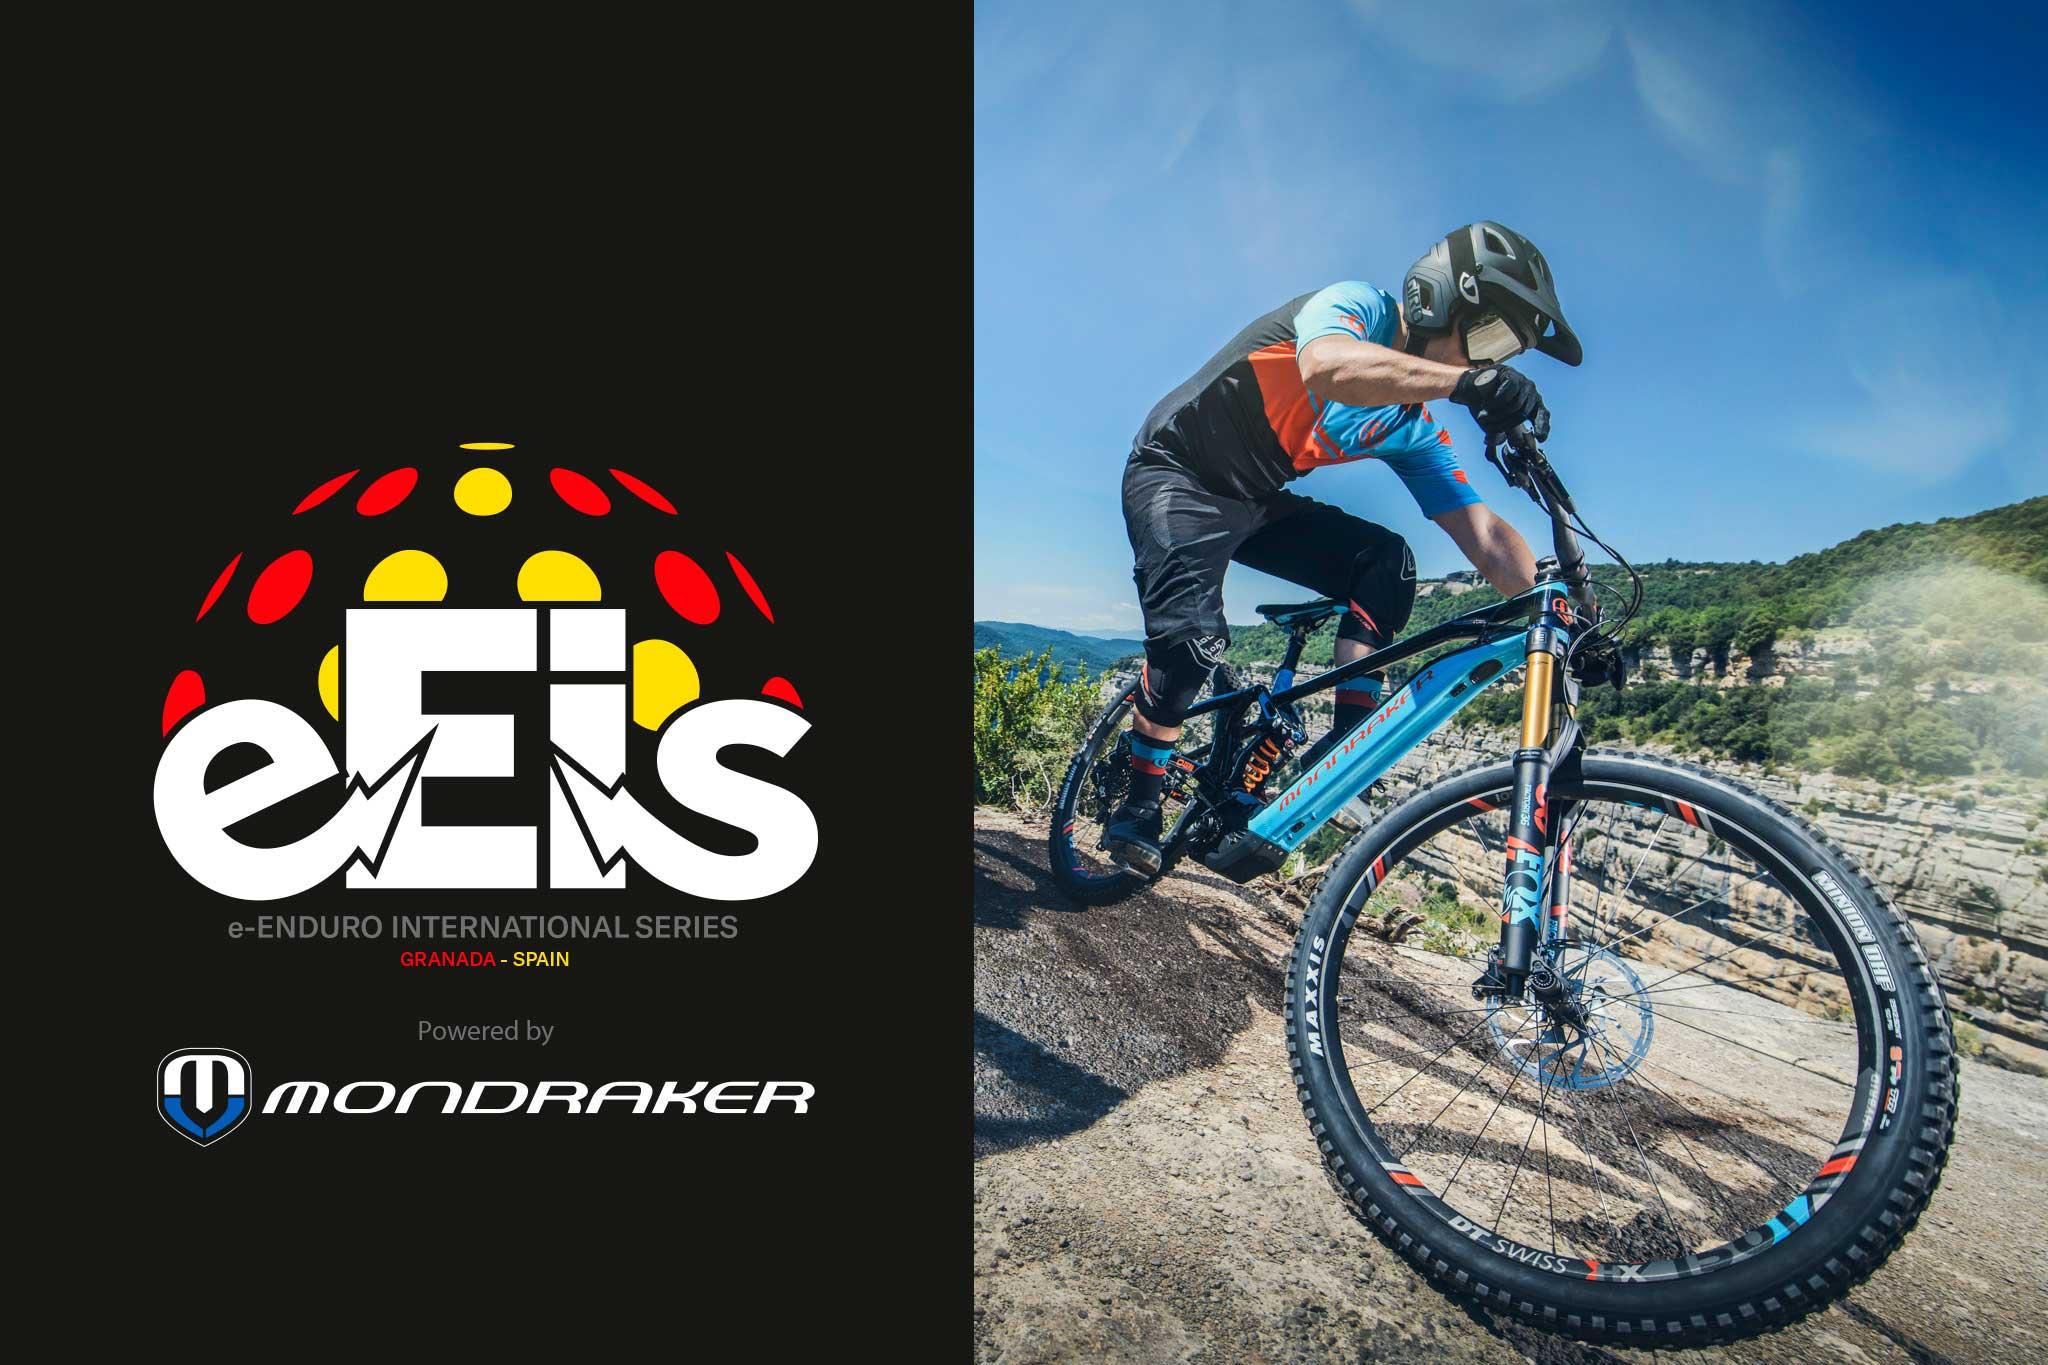 e-EIS Powered by Mondraker